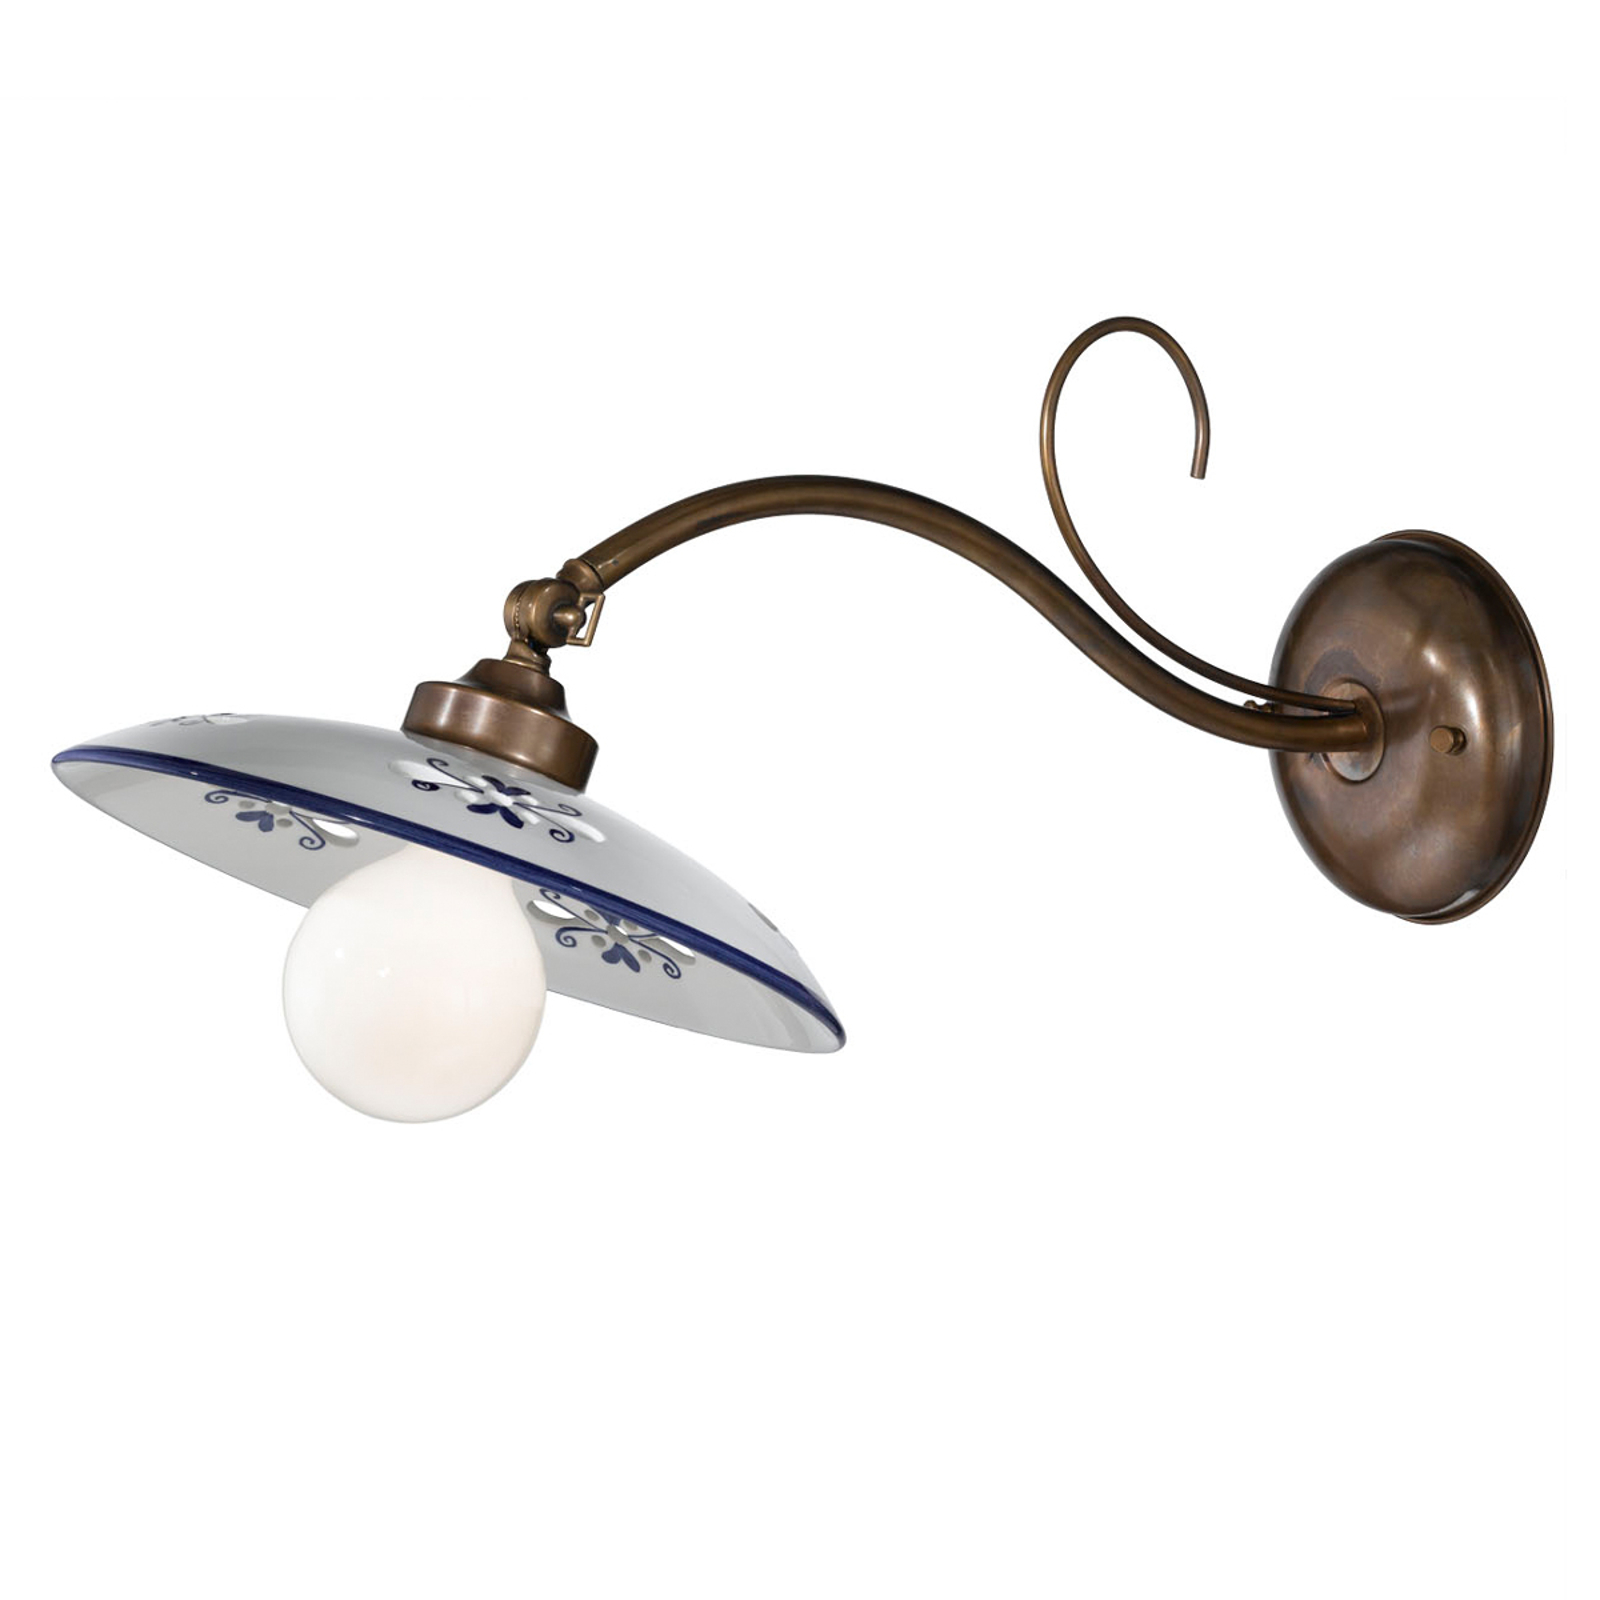 Wandlampe Bassano, Keramikschirm, ausladend, blau